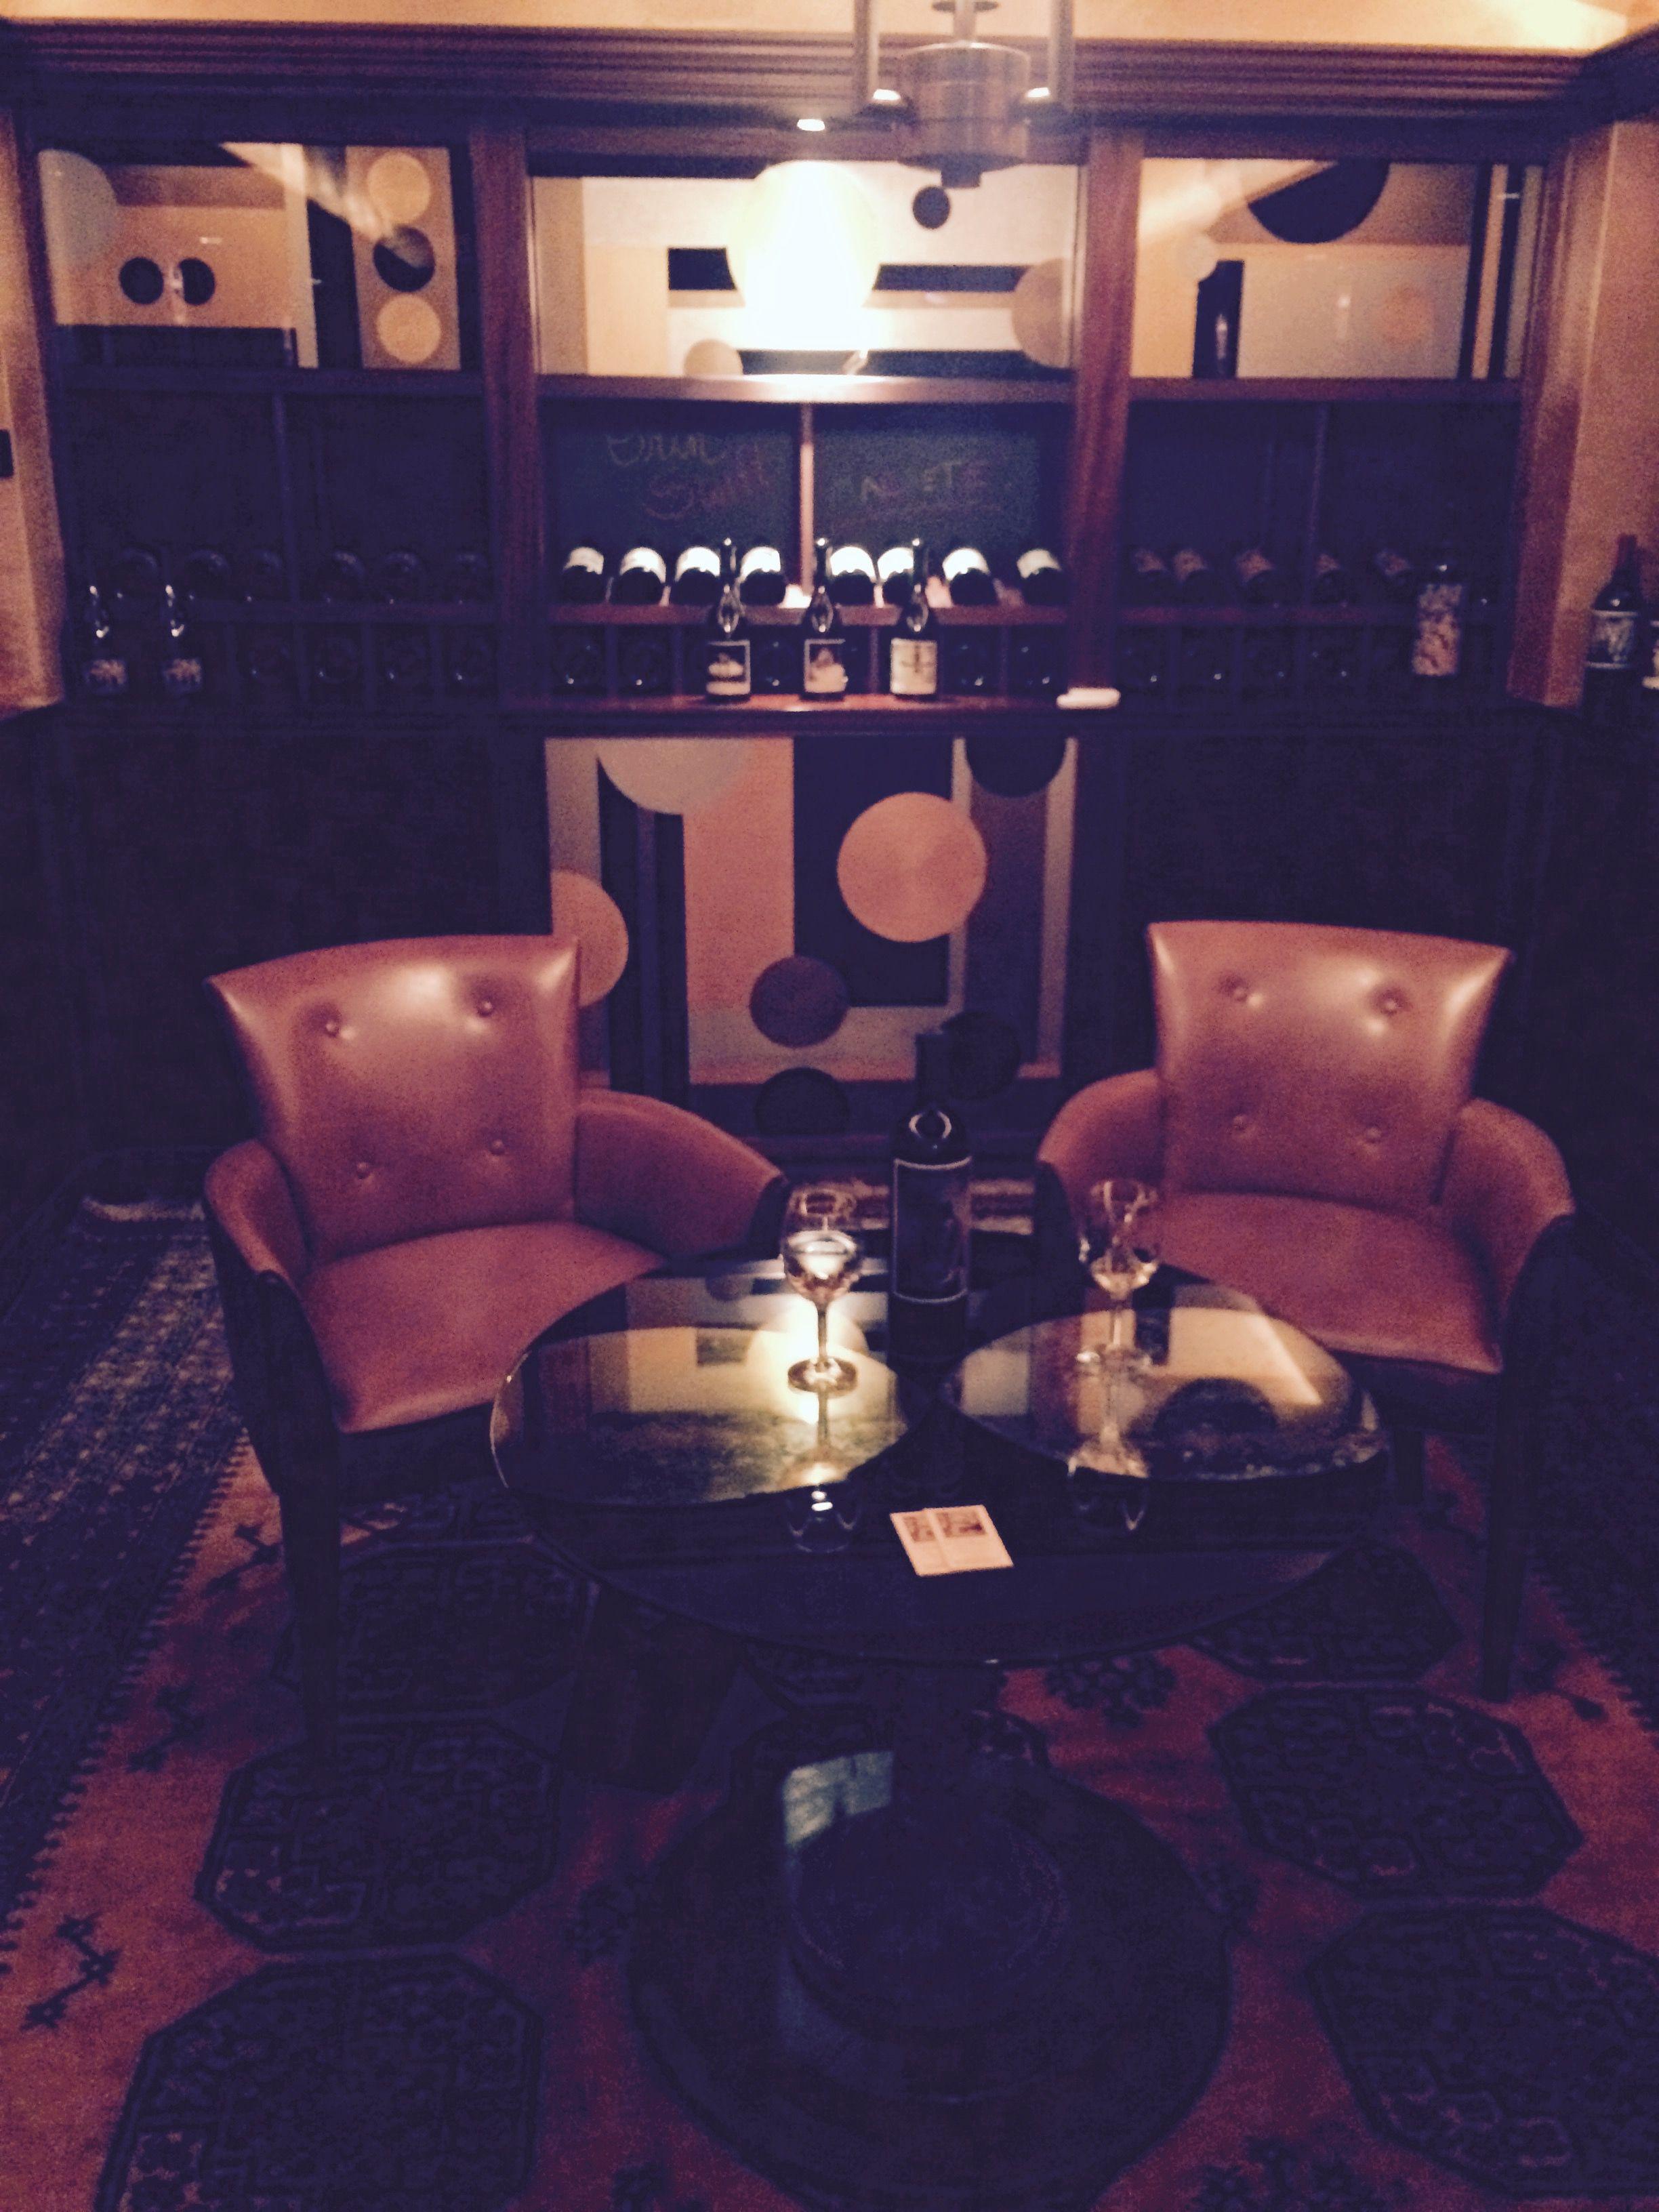 The Wine Cellar designed by Jane Richardson